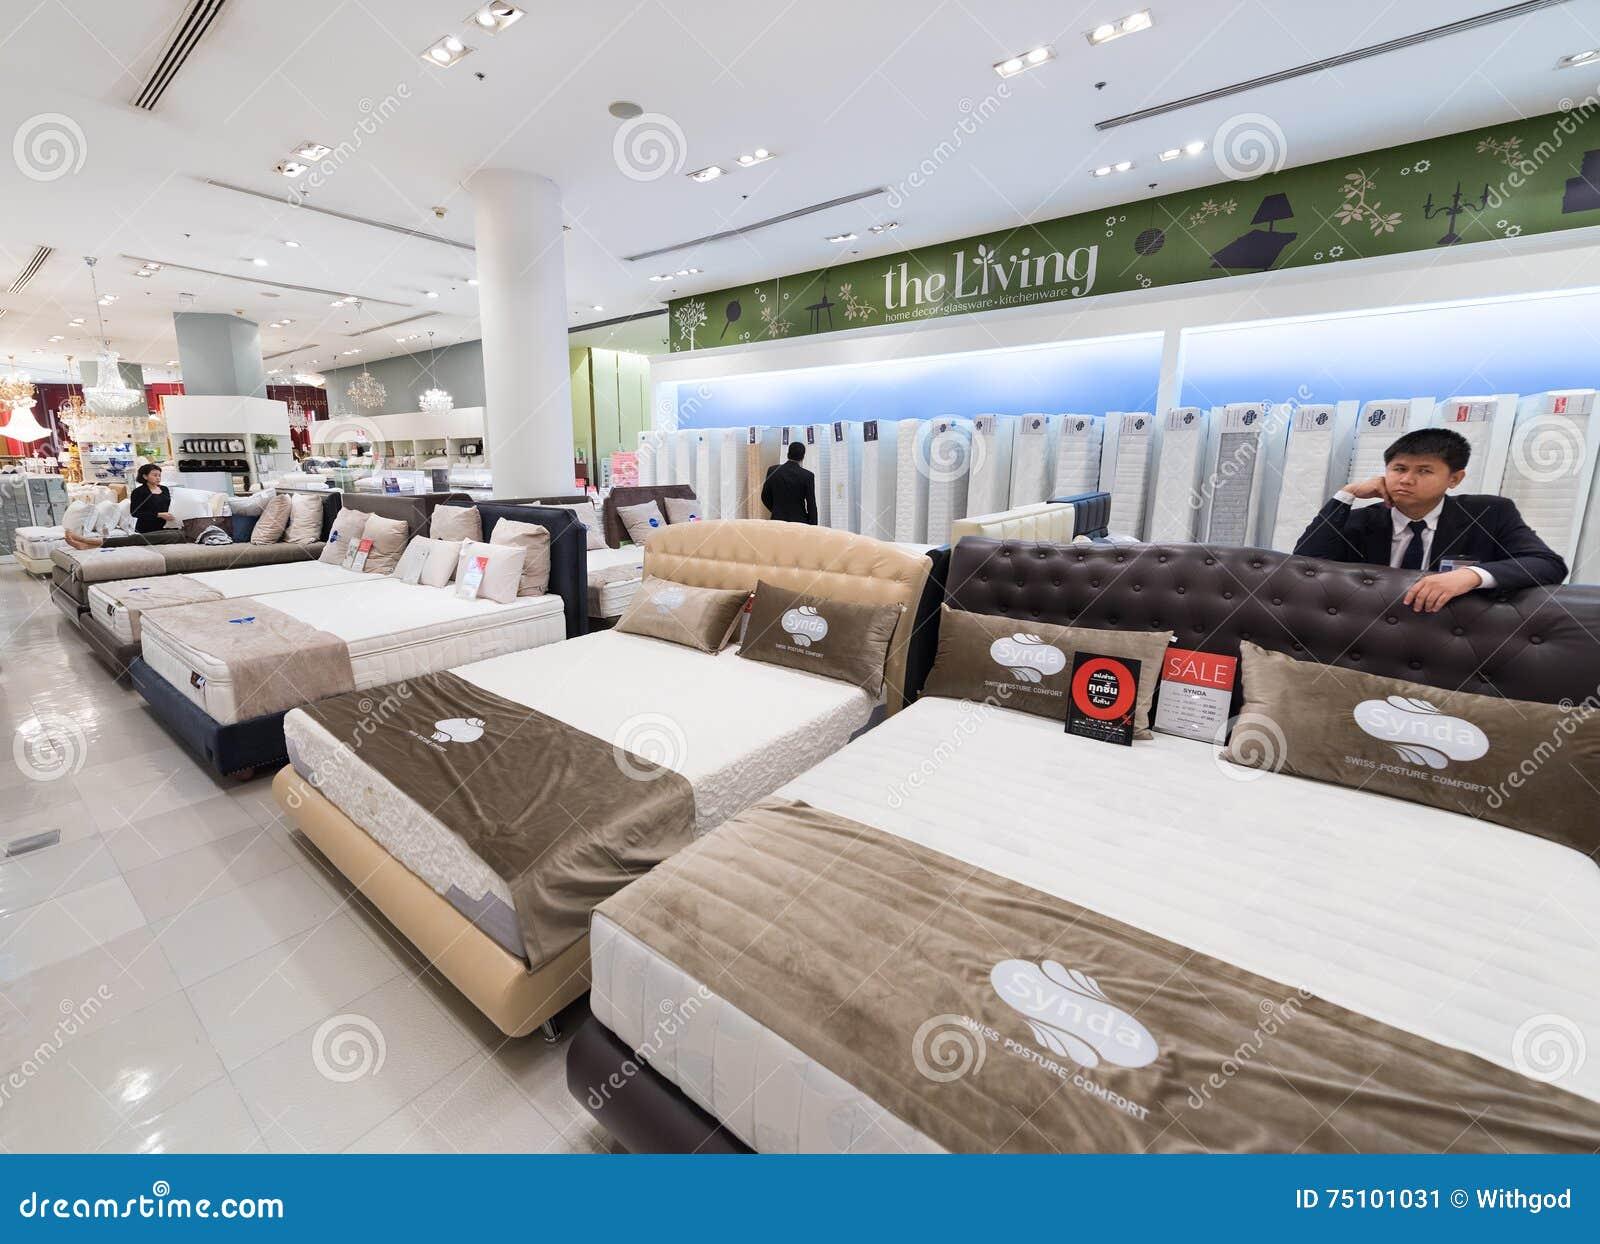 single package beds furniture bedroom melbourne within amart sets value ikea unit white australia for city deals fantastic packages suites brighton mattress online